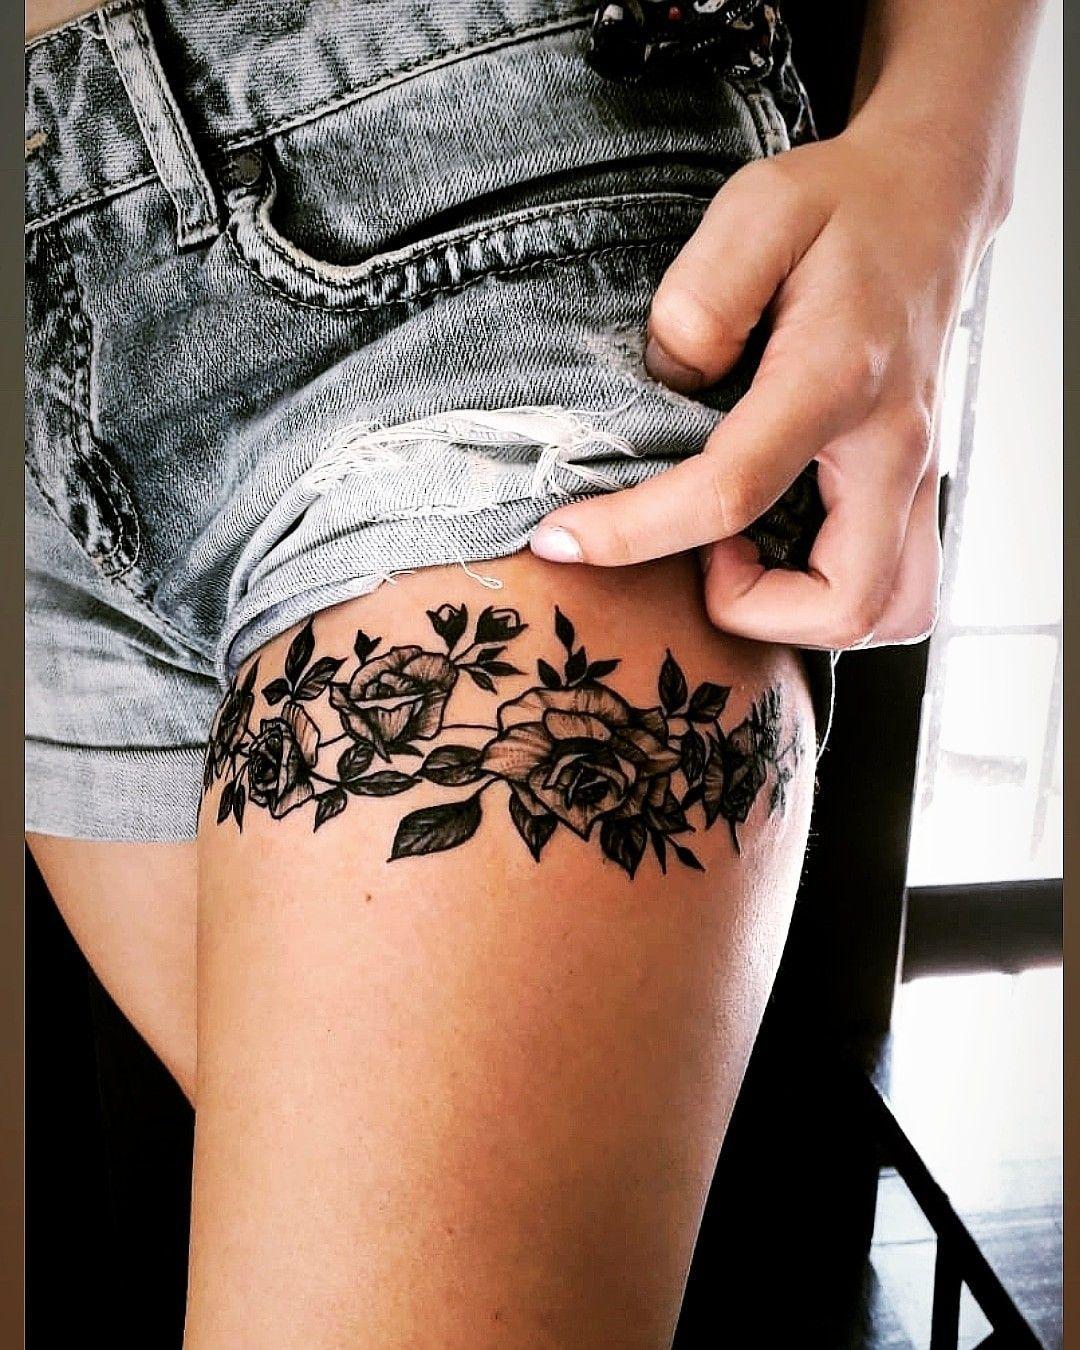 Tatto tatuagem rosa na perna | Tatuagem na coxa, Tatuagem coxa feminina, Tatuagem